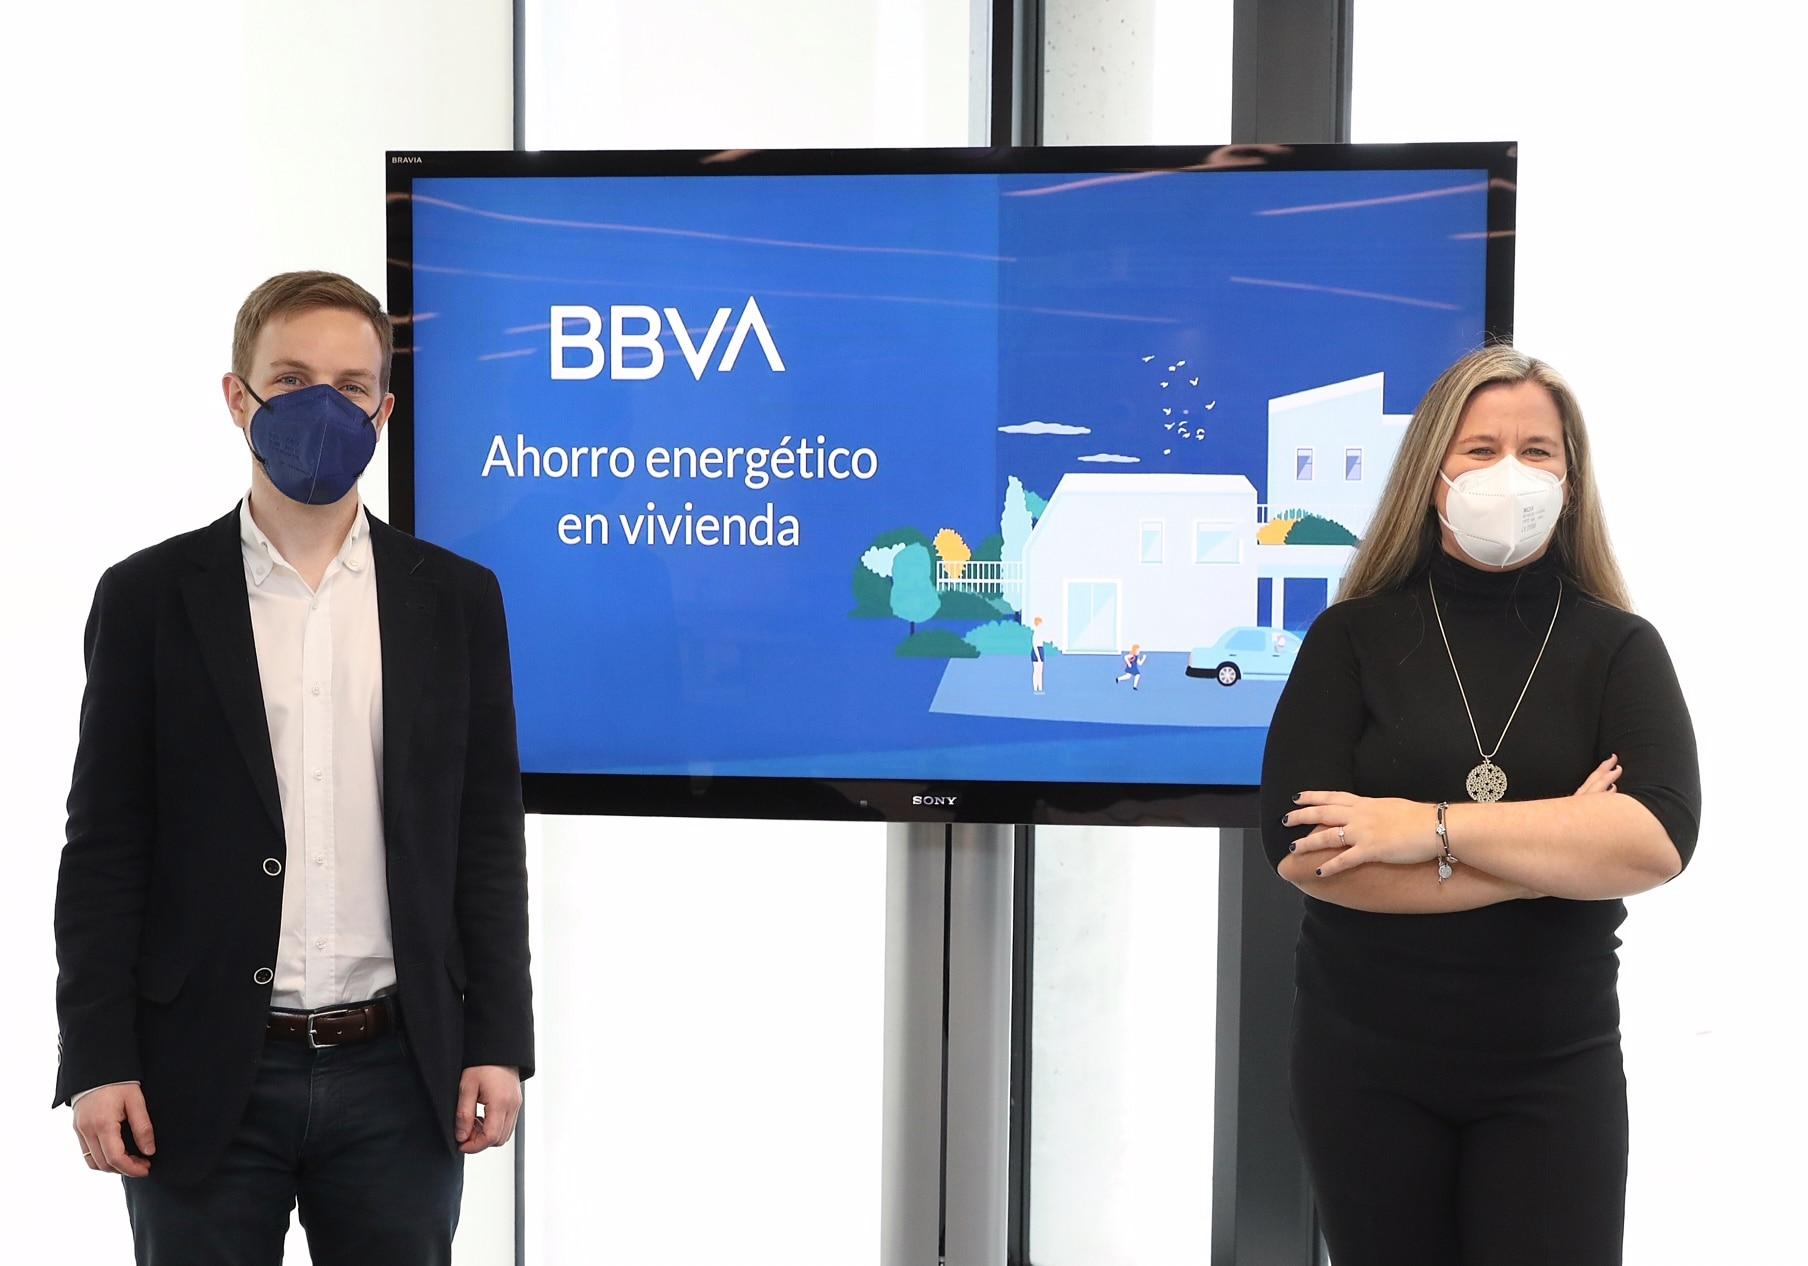 presentacion-ahorro-energetico-vivienda-bbva